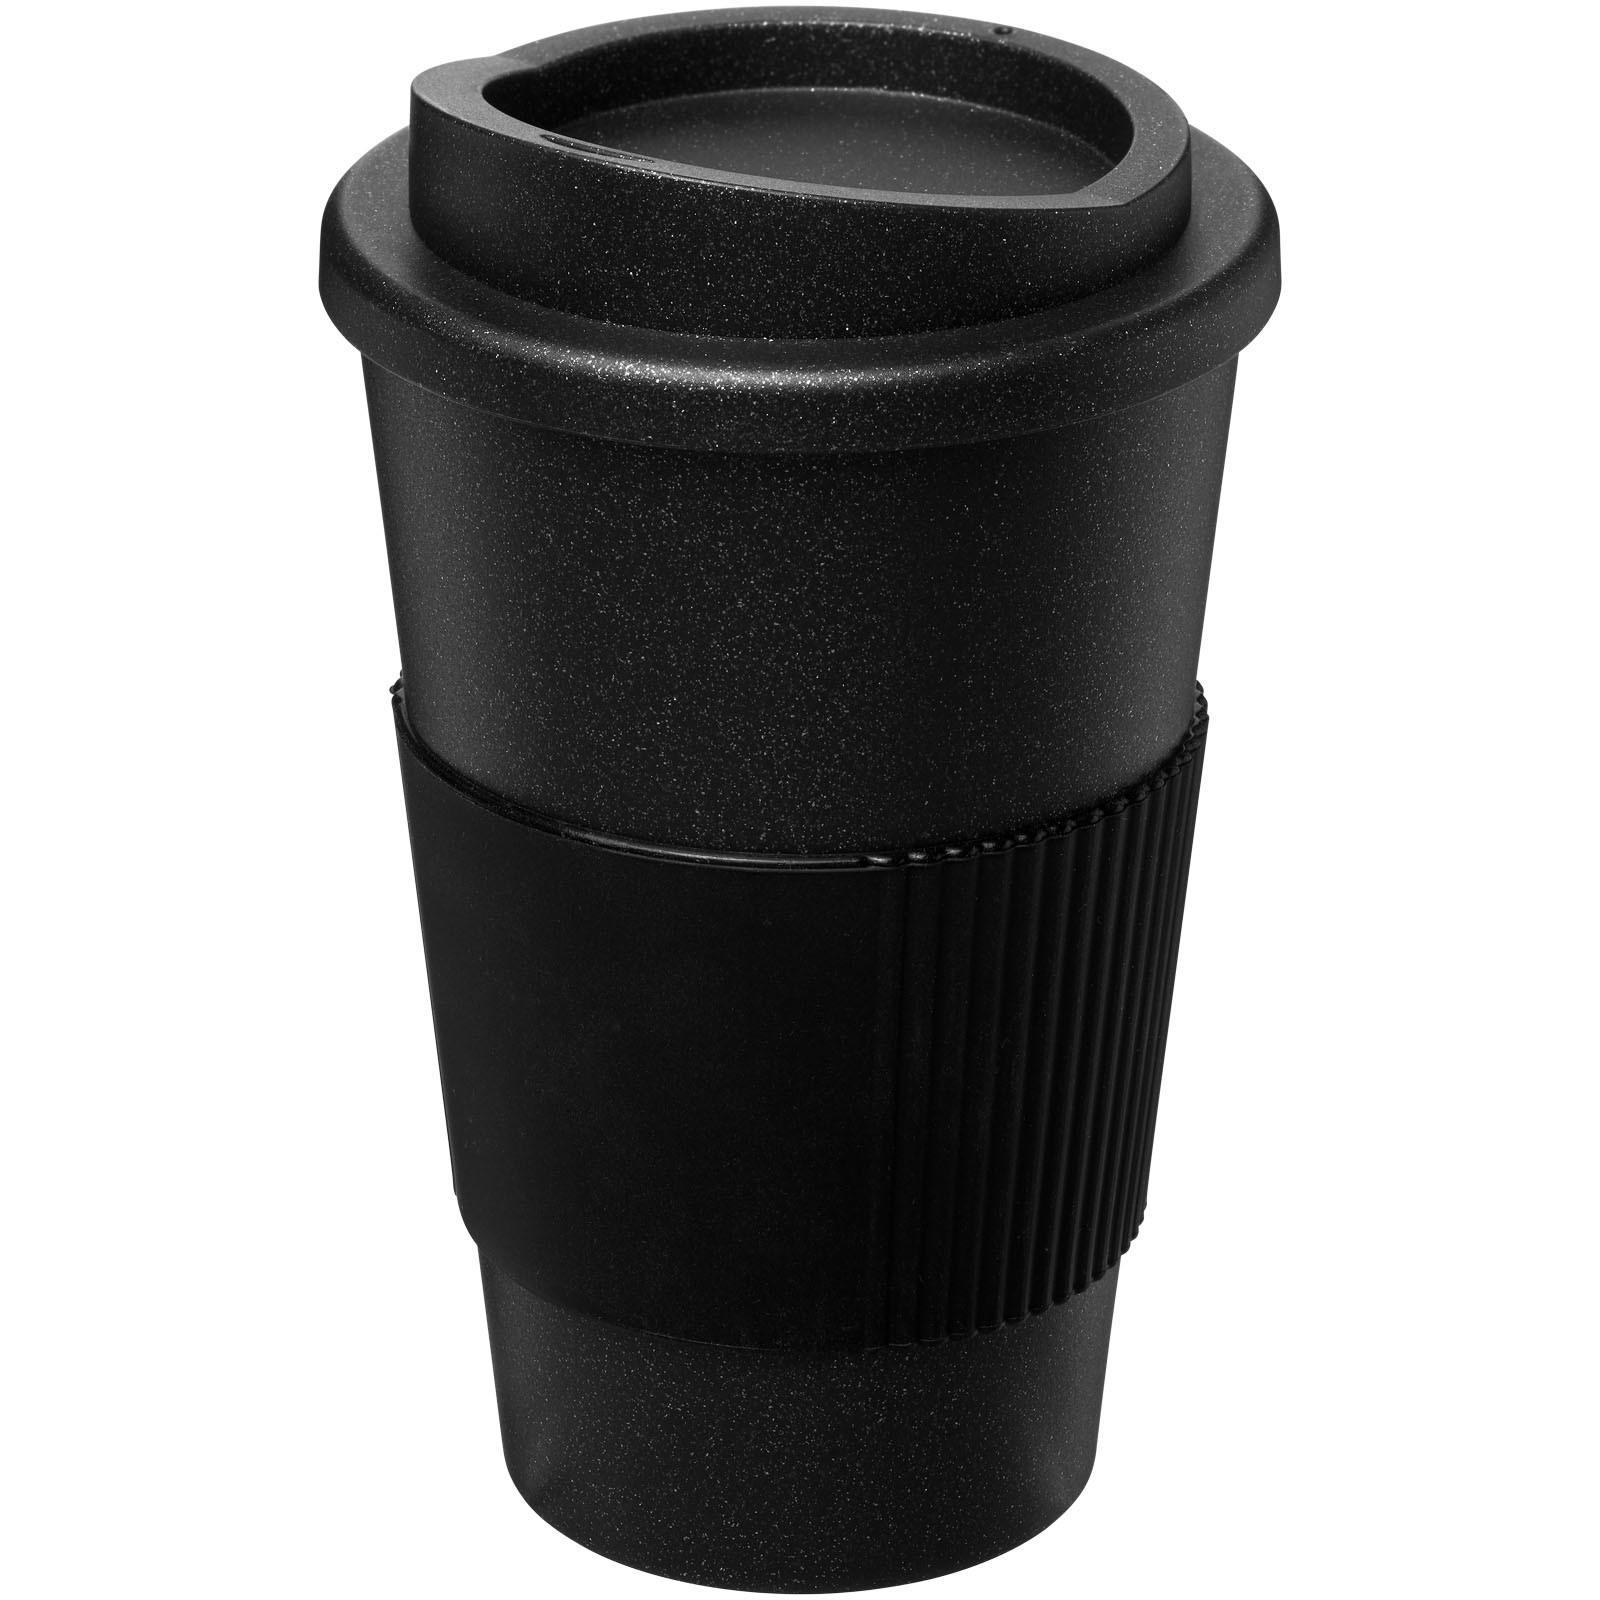 Americano® Vaso térmico Midnight de 350 ml - Negro intenso